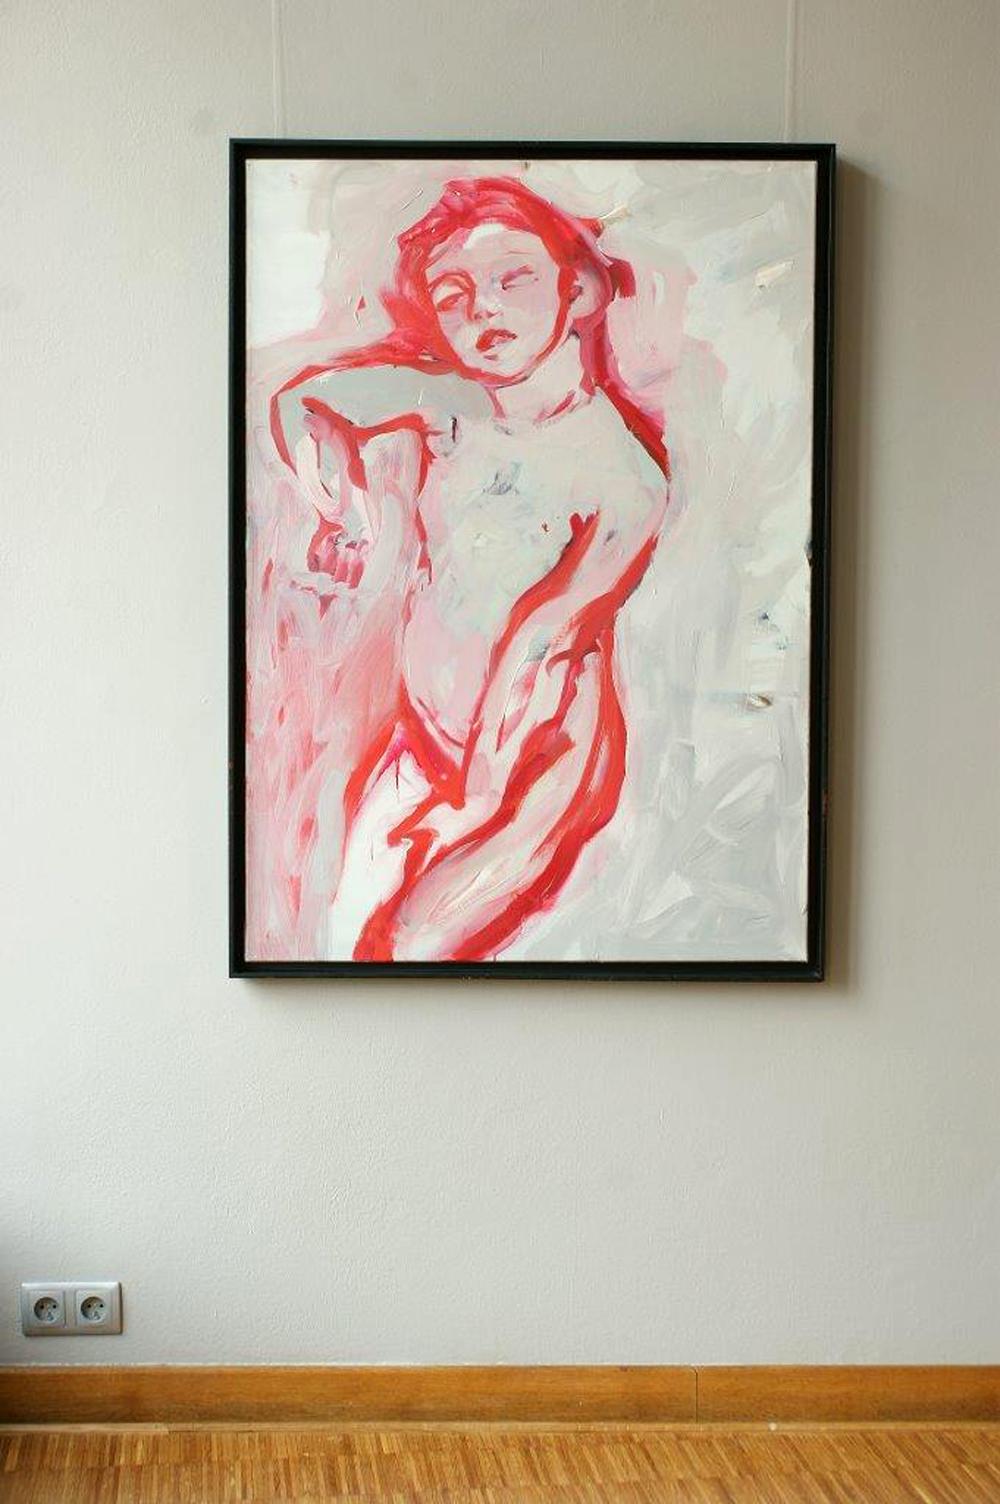 Katarzyna Swinarska : Sleeping figure